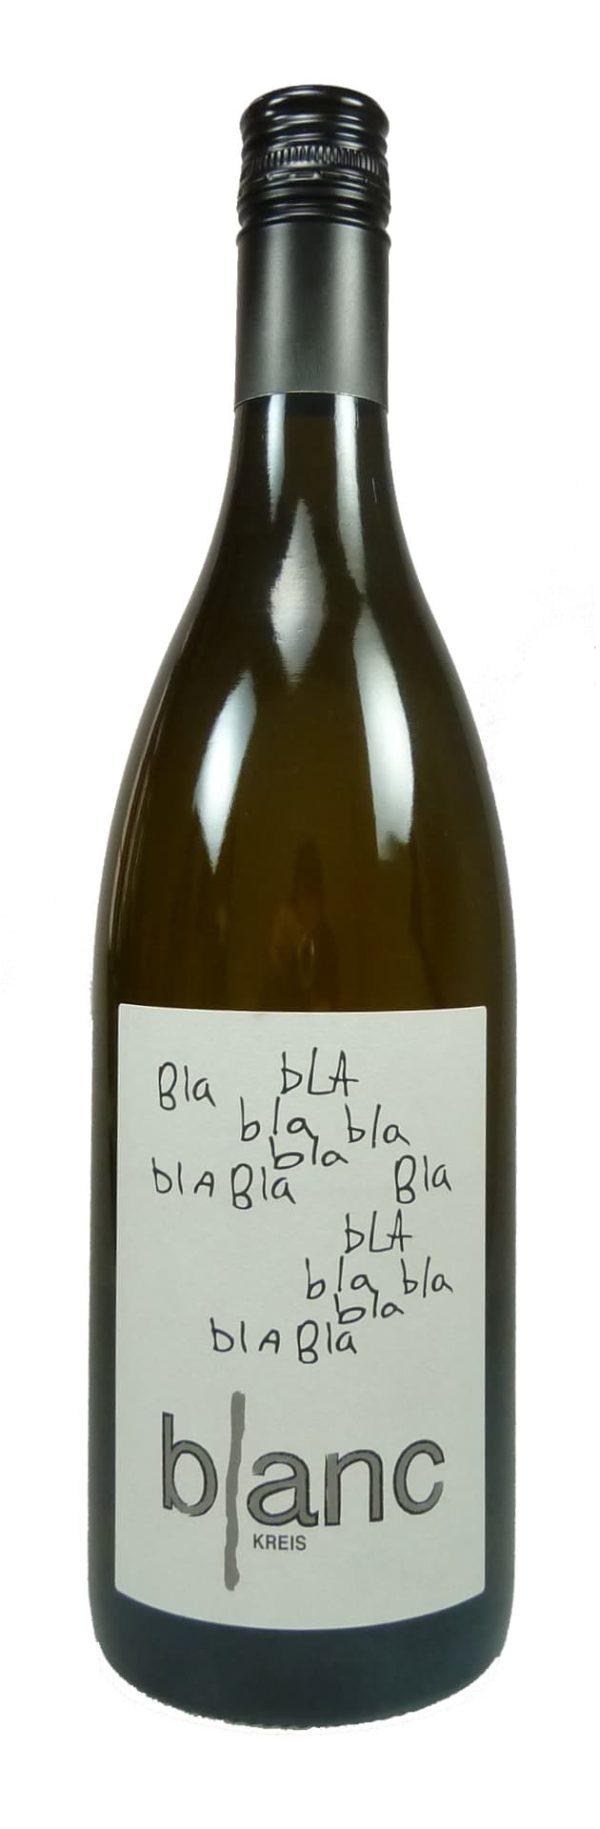 bla-bla-blanc Weißwein trocken 2017